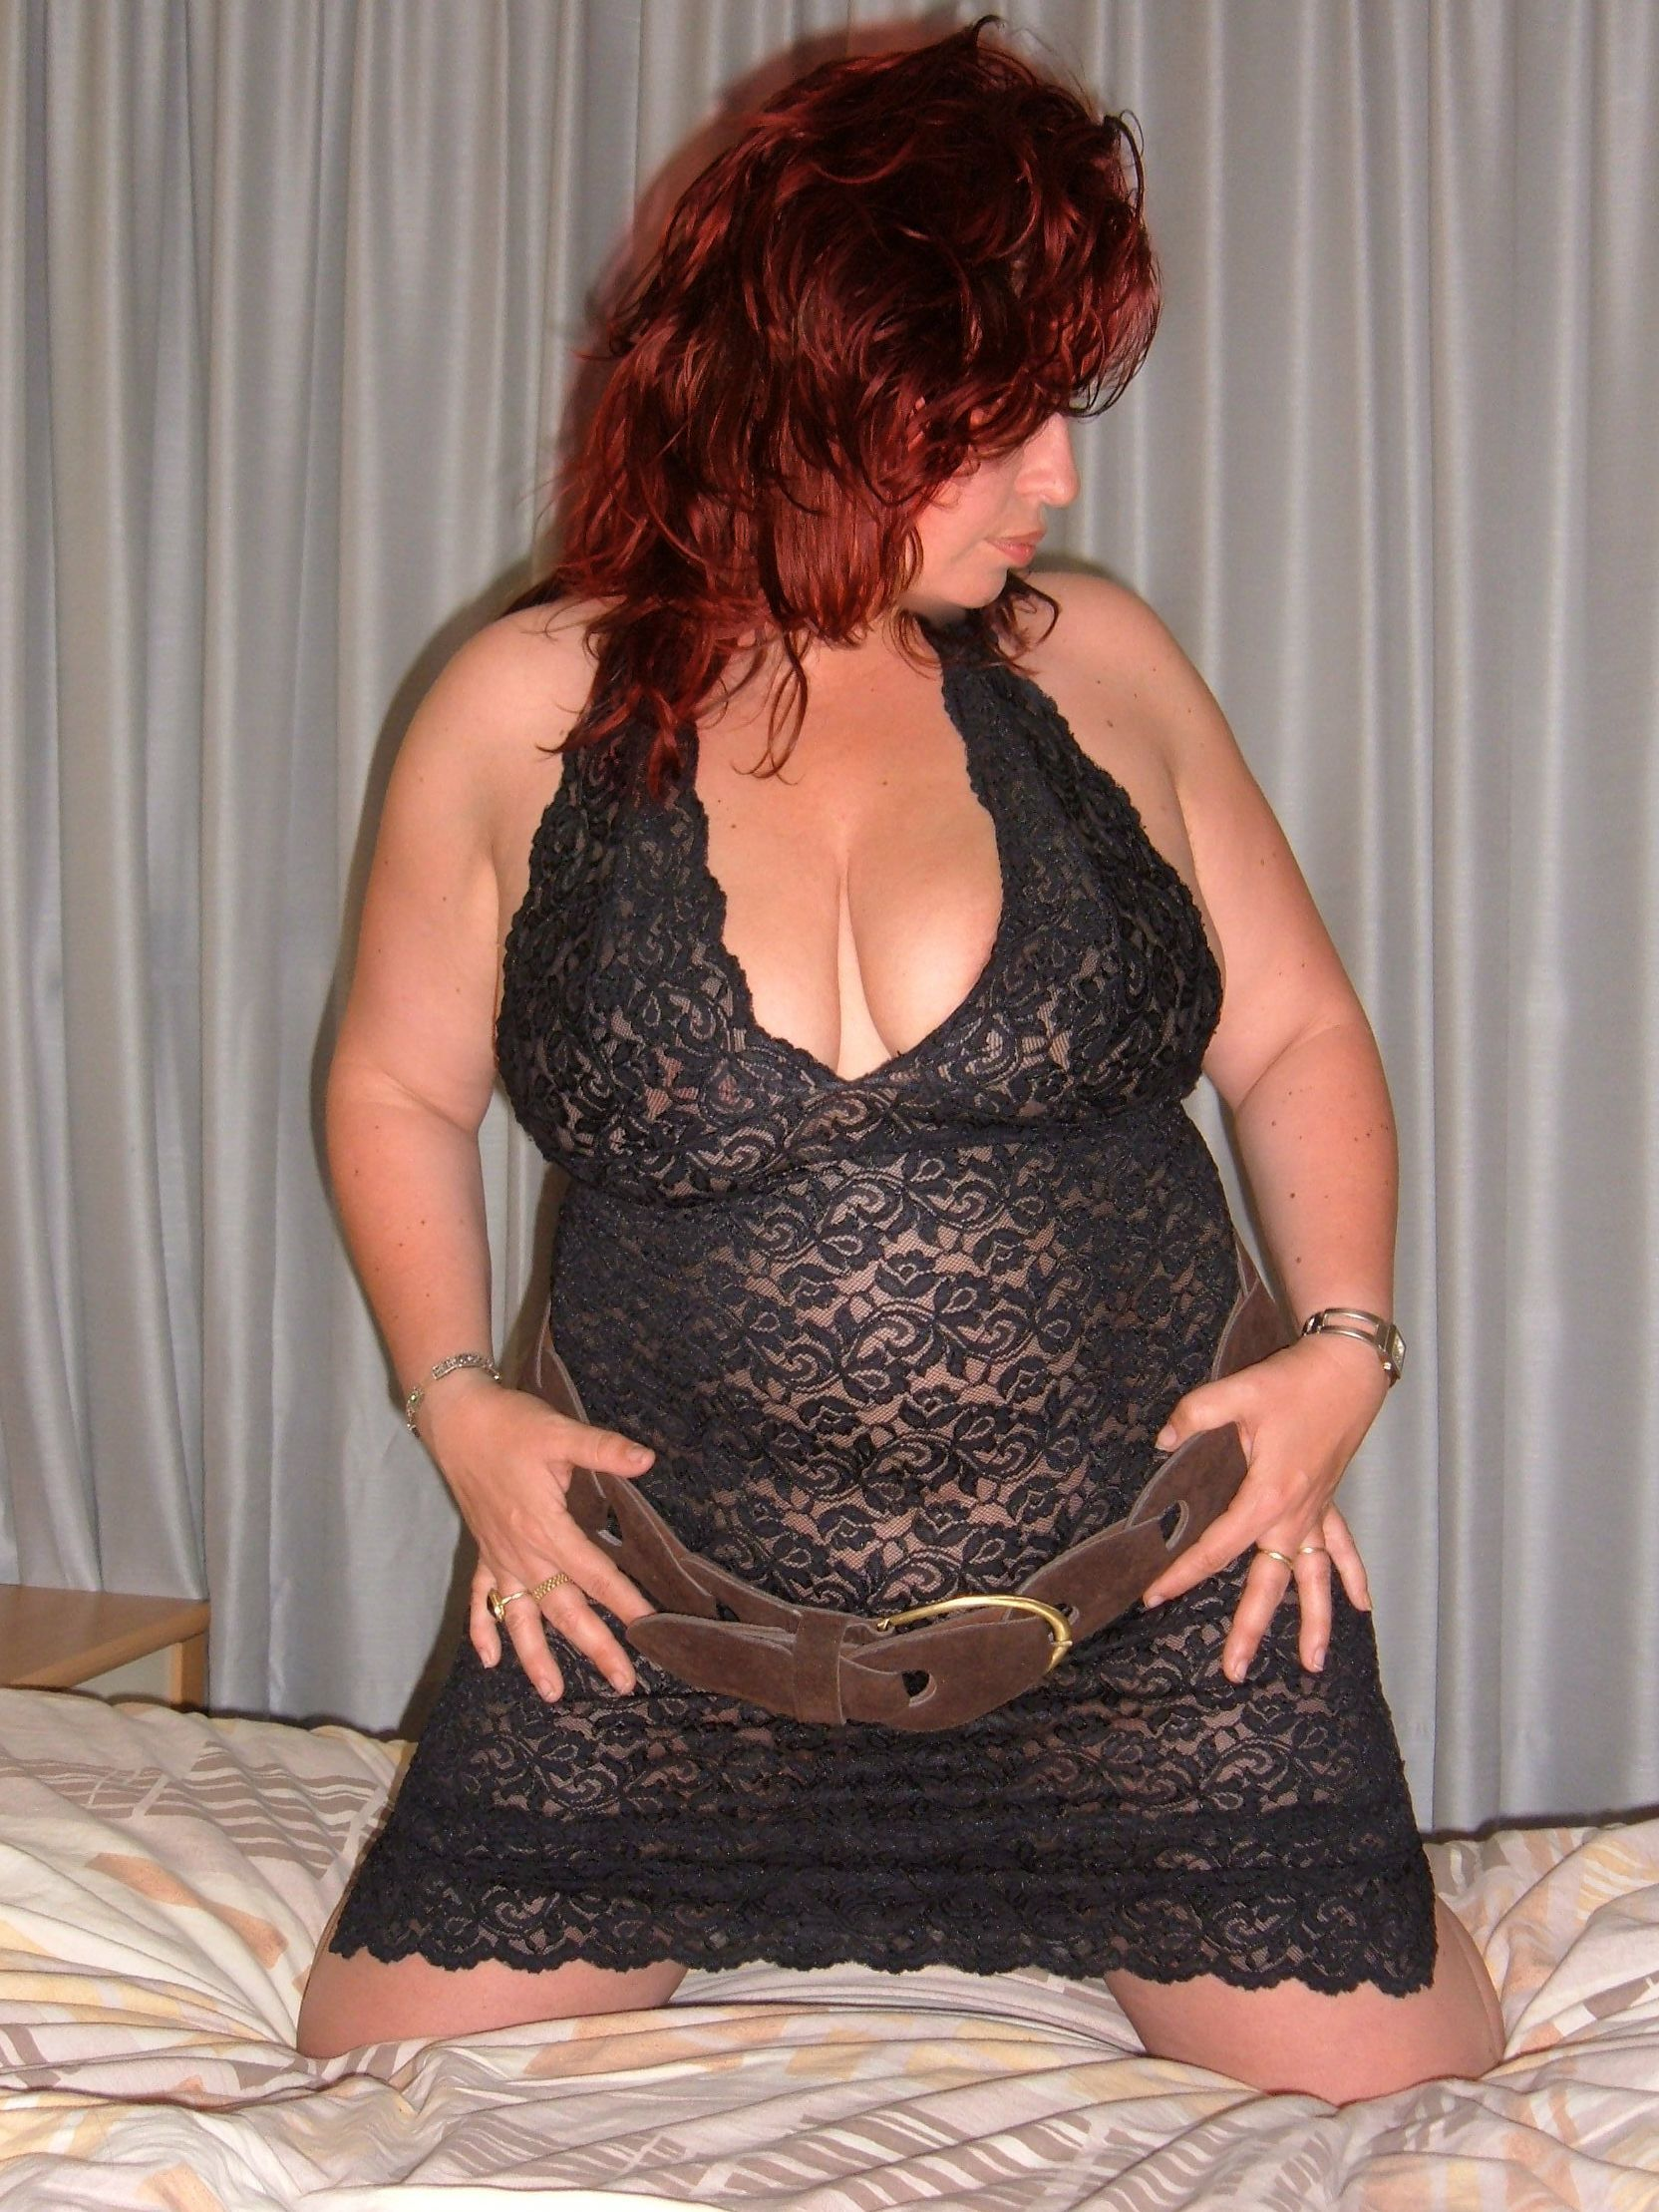 geile blote meiden neukende dikke vrouwen